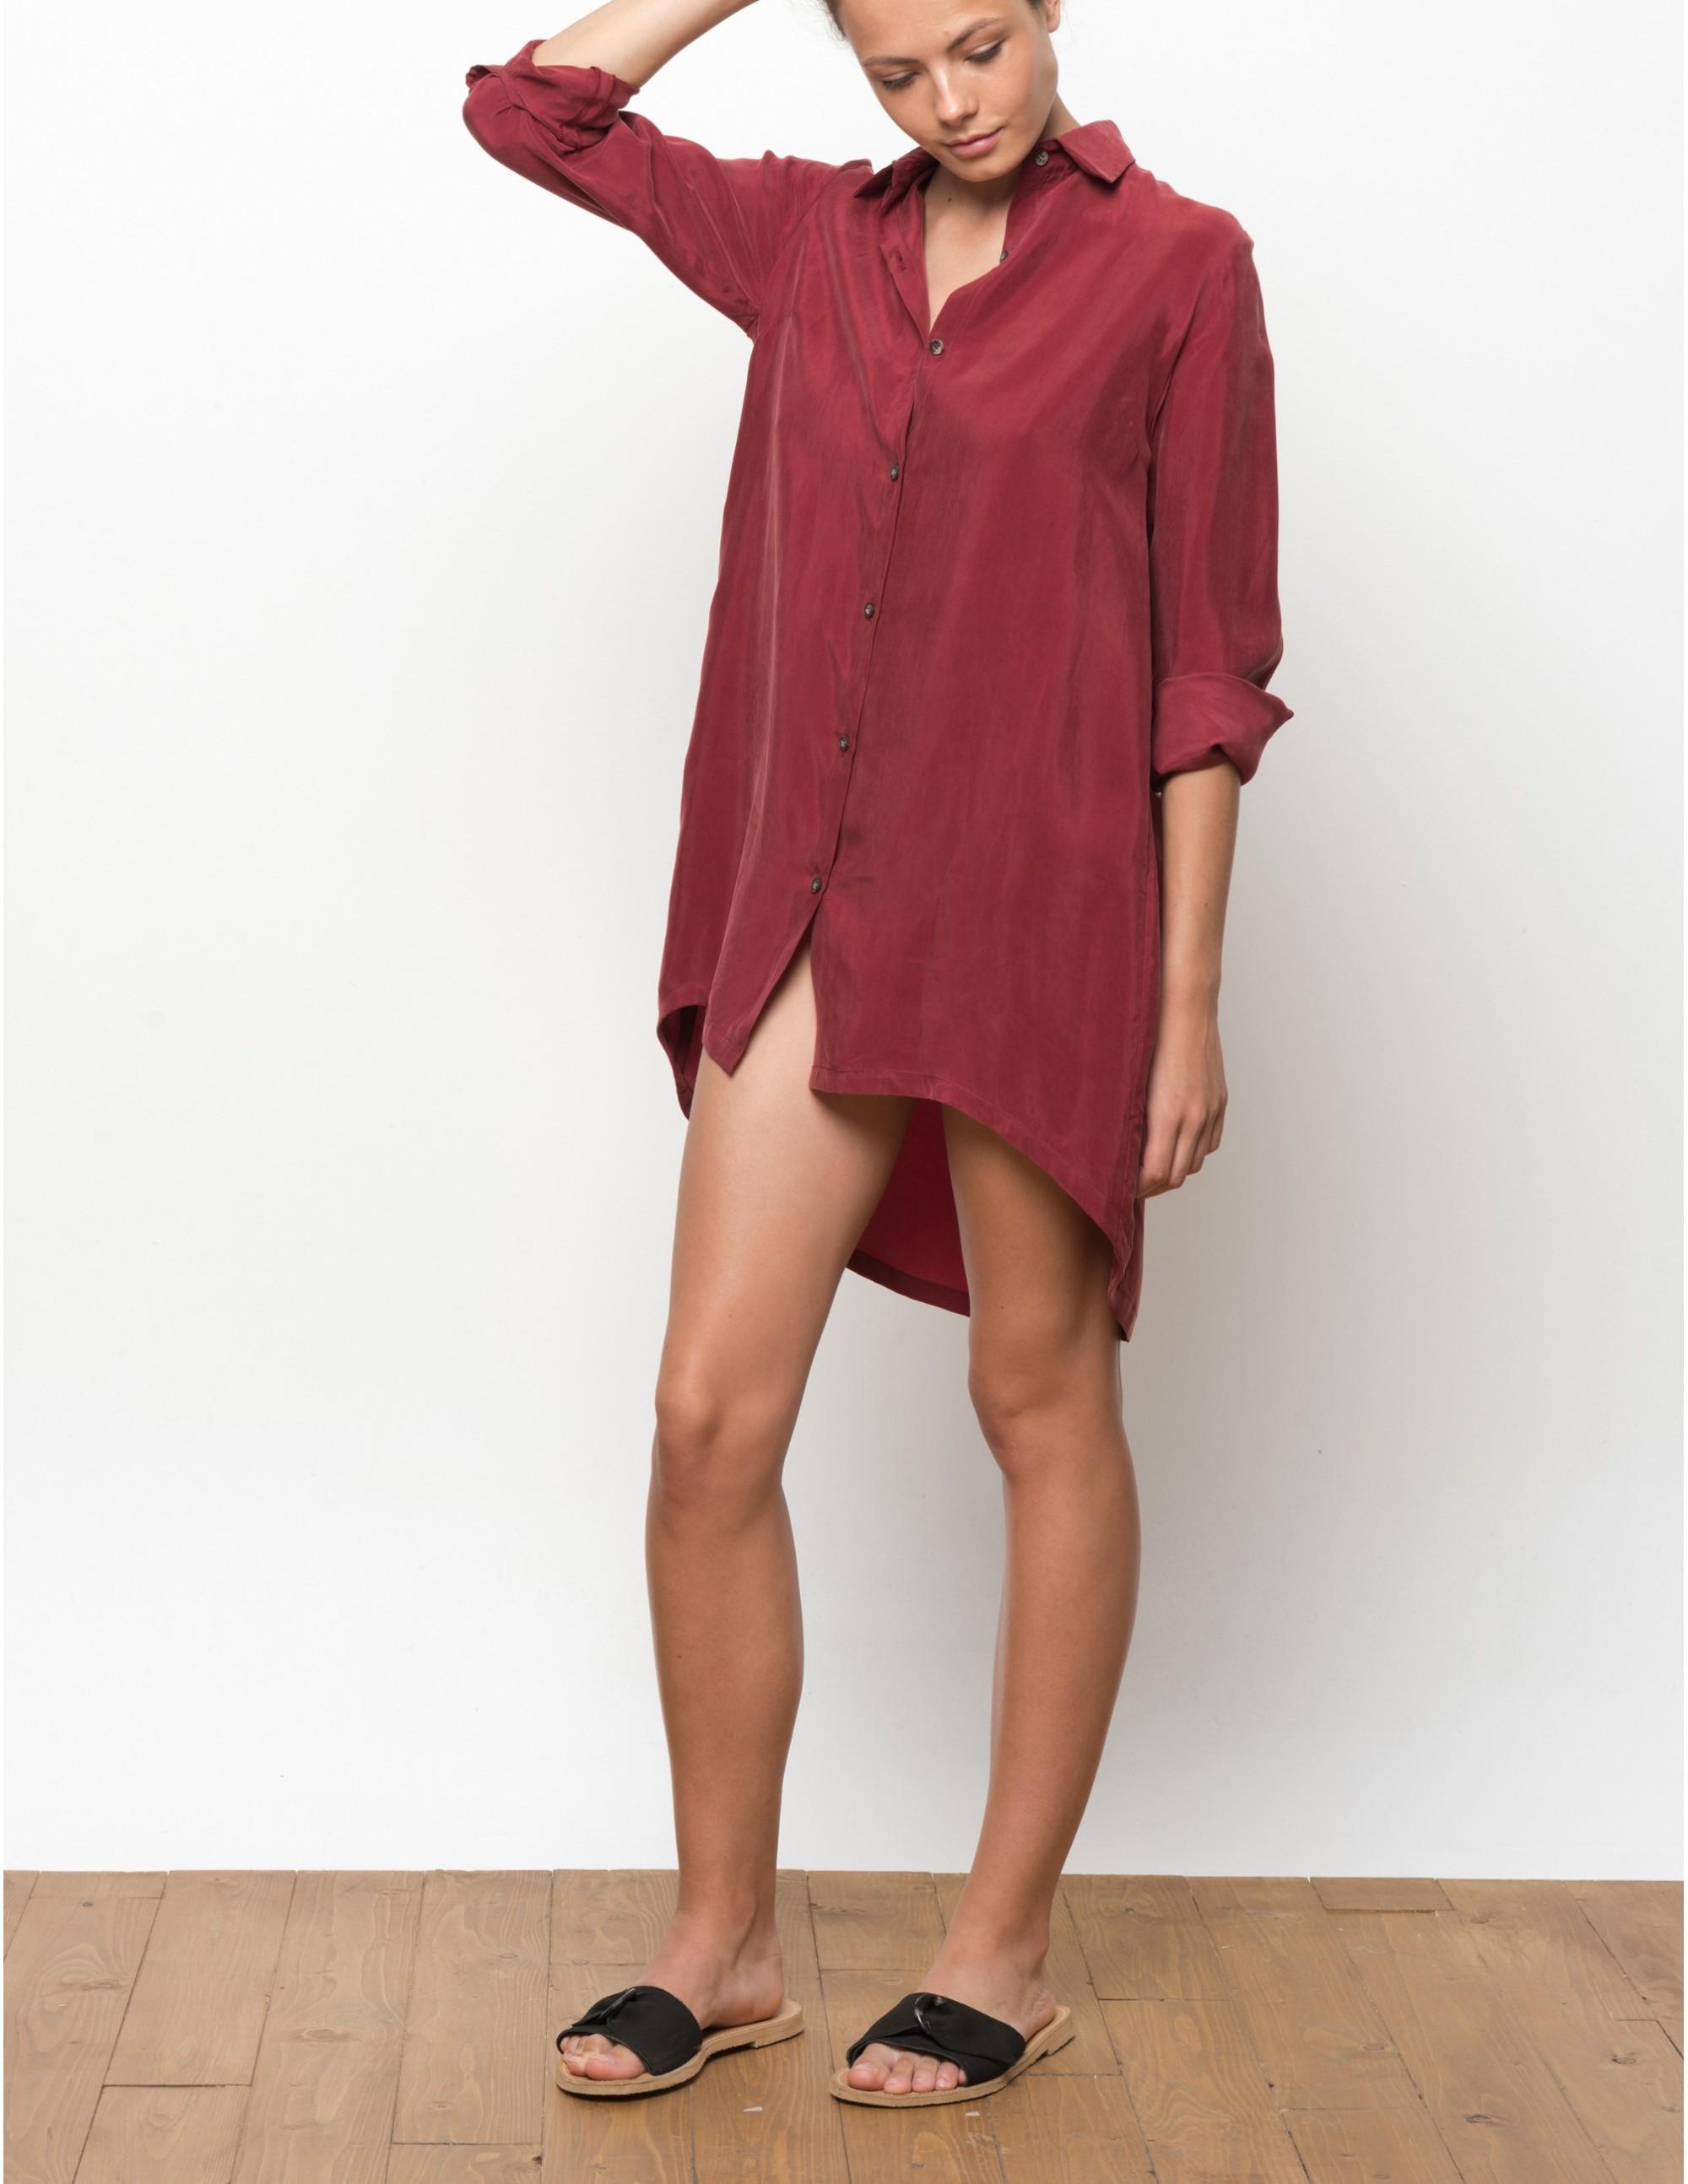 KIGO shirt - MASAAI